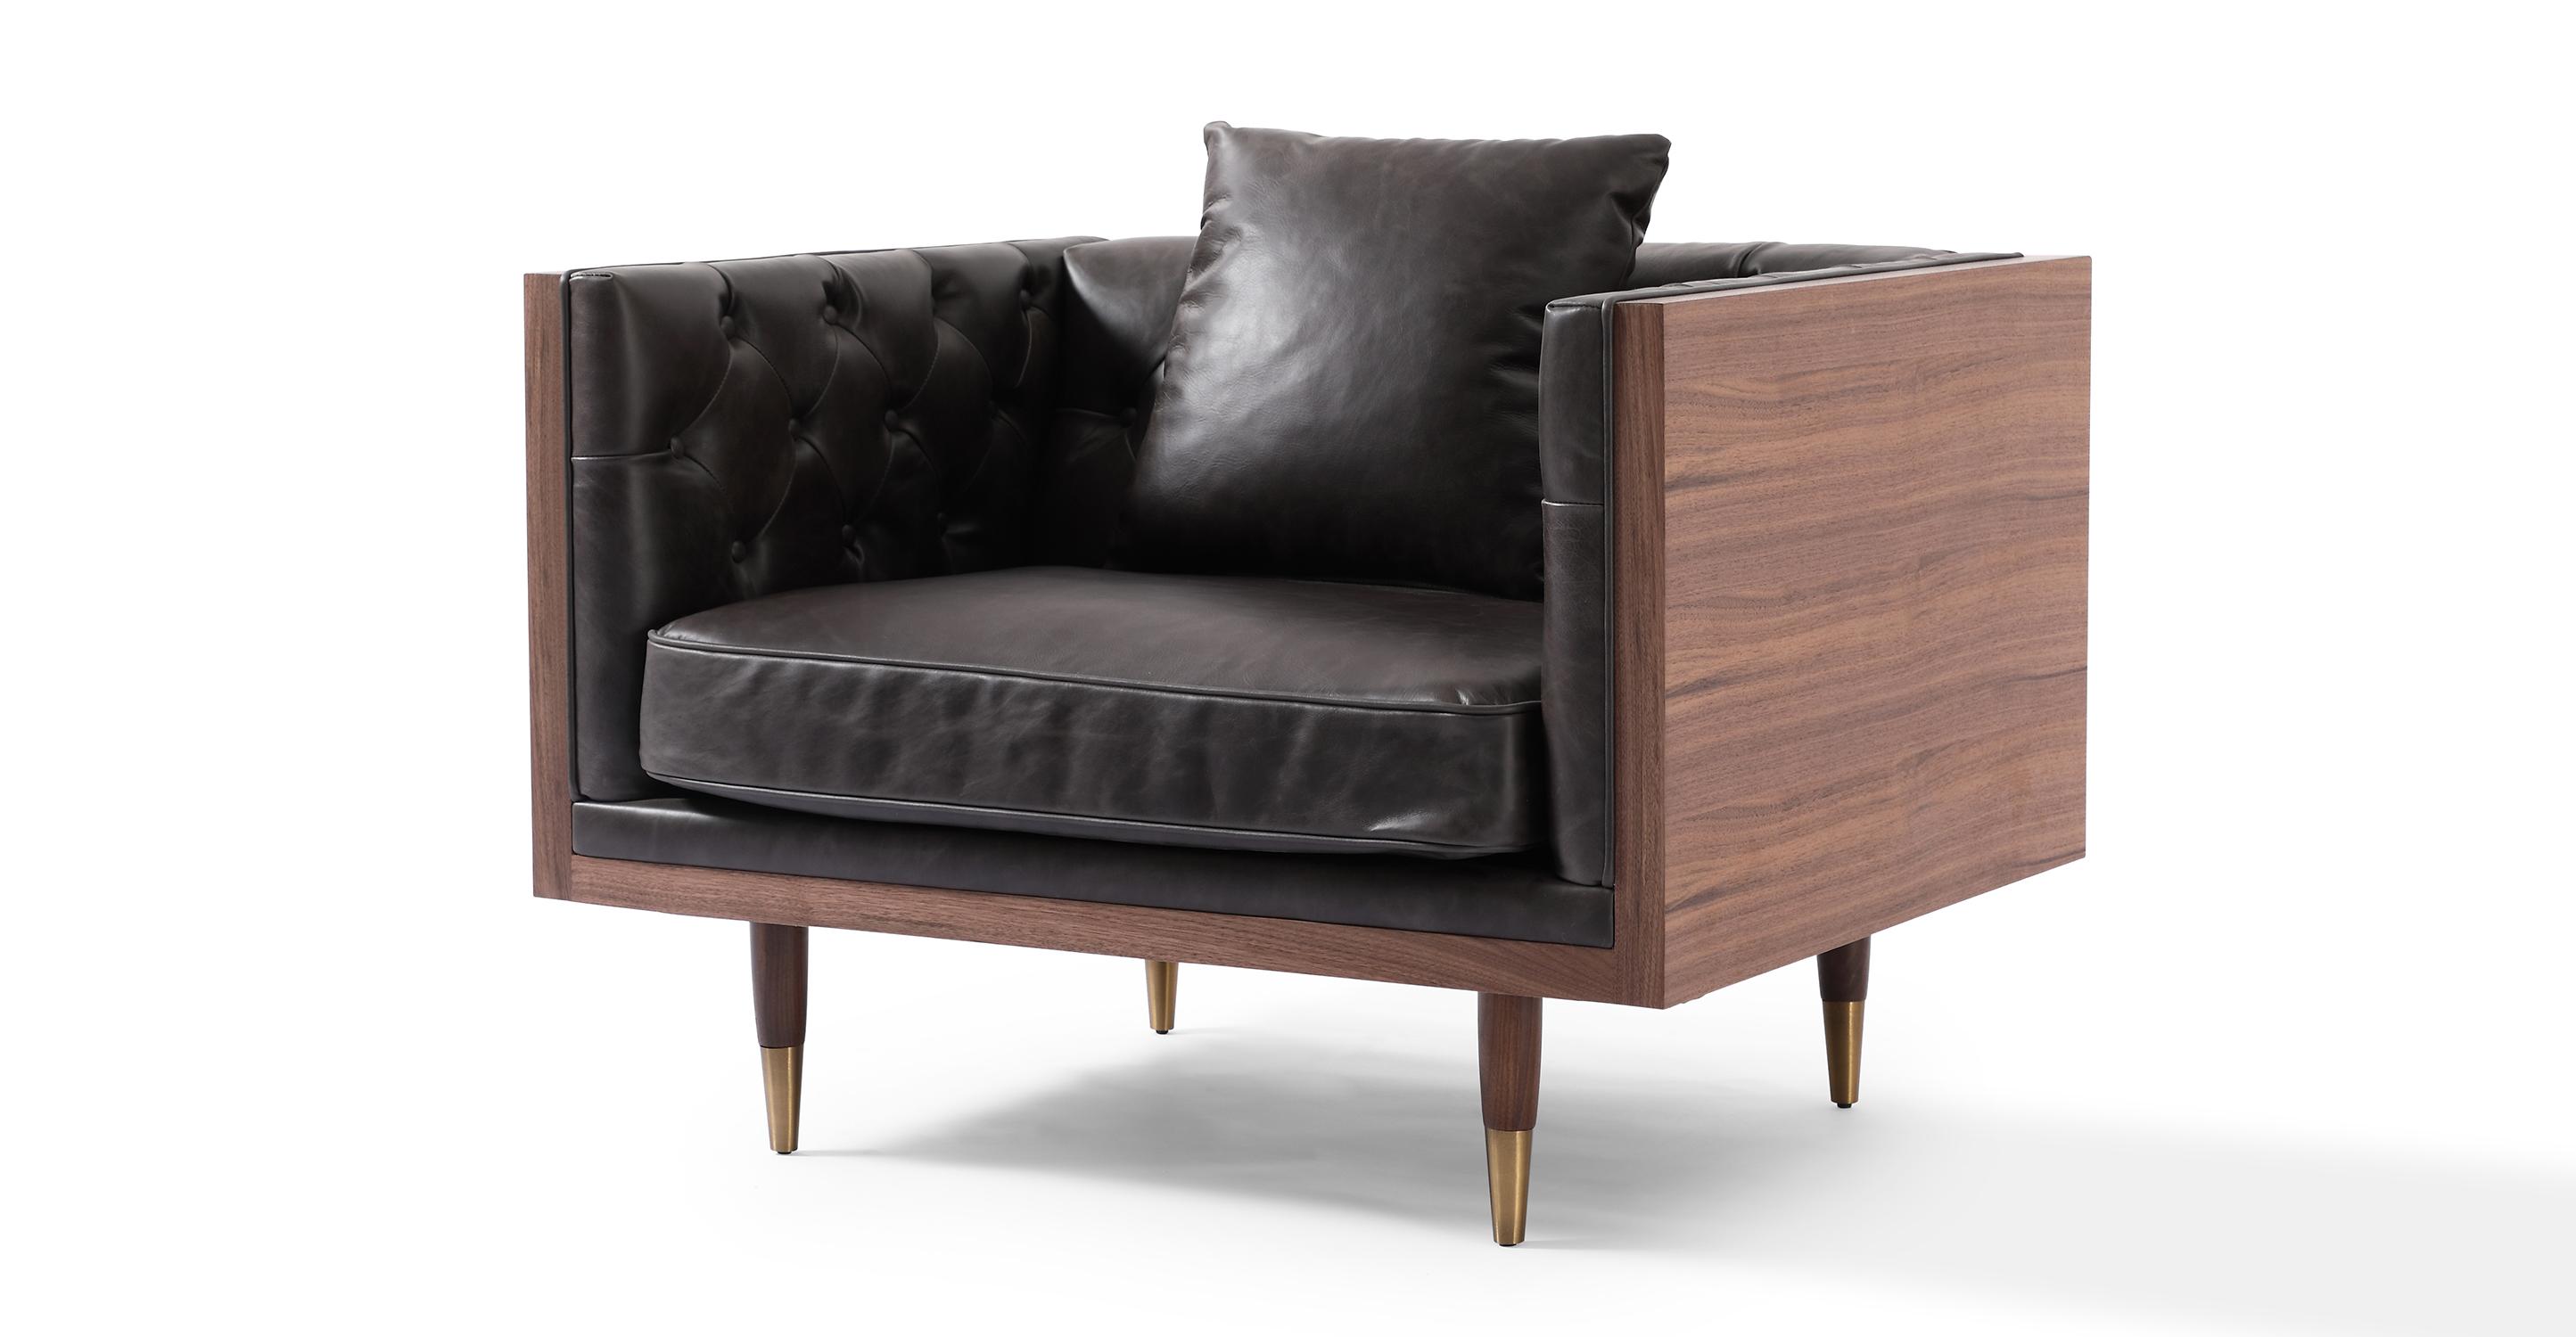 "Woodrow Neo 39"" Leather Chair, Walnut/Saddle Black"